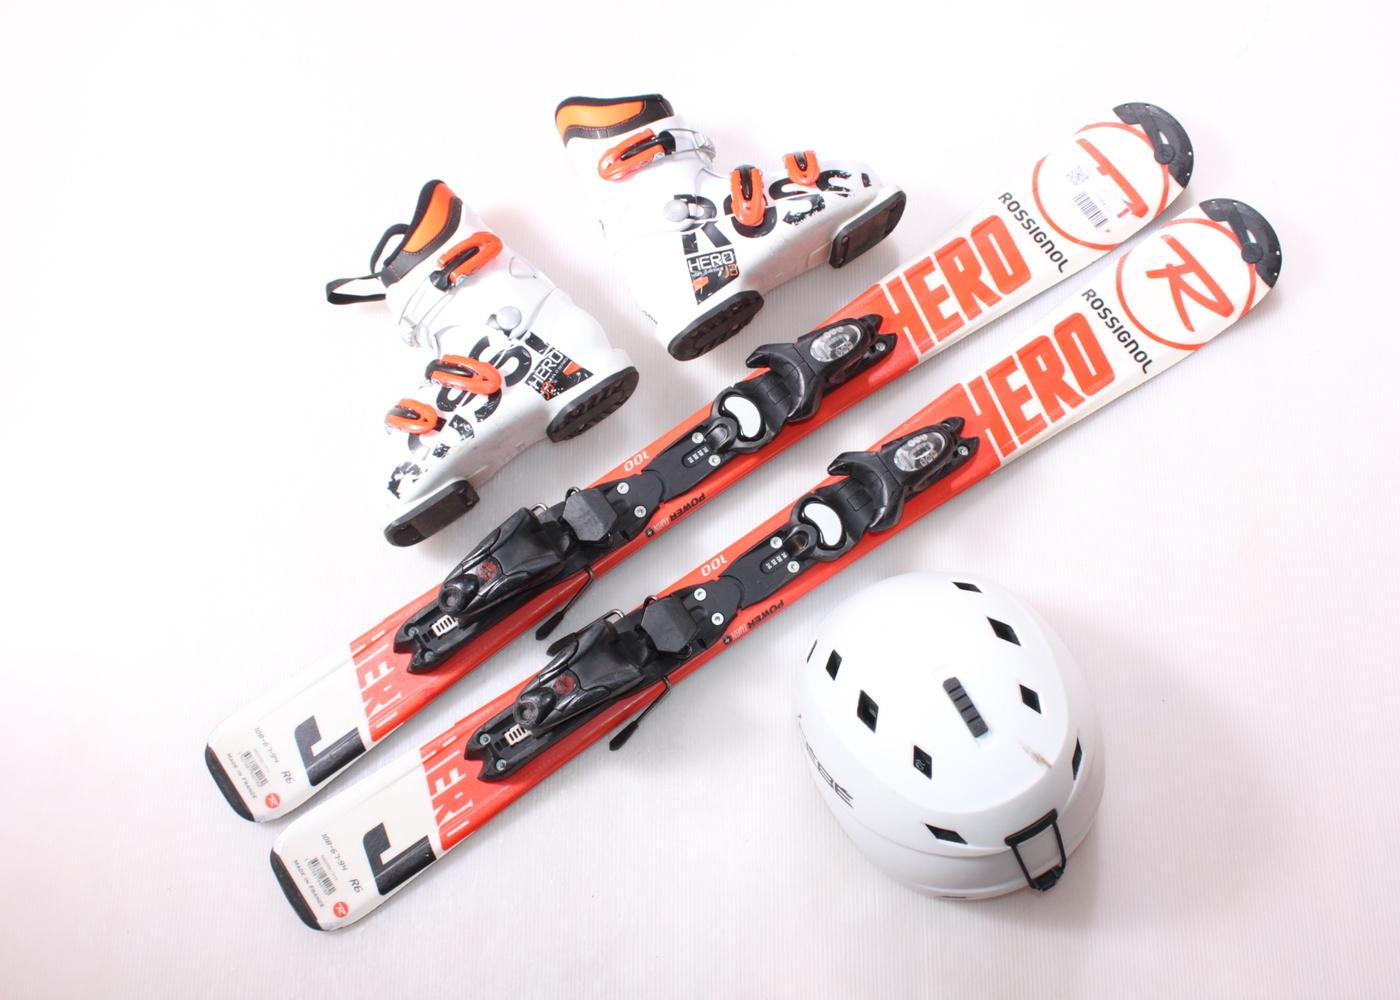 Dětské lyže ROSSIGNOL HERO J 100 cm + lyžáky  32EU + helma